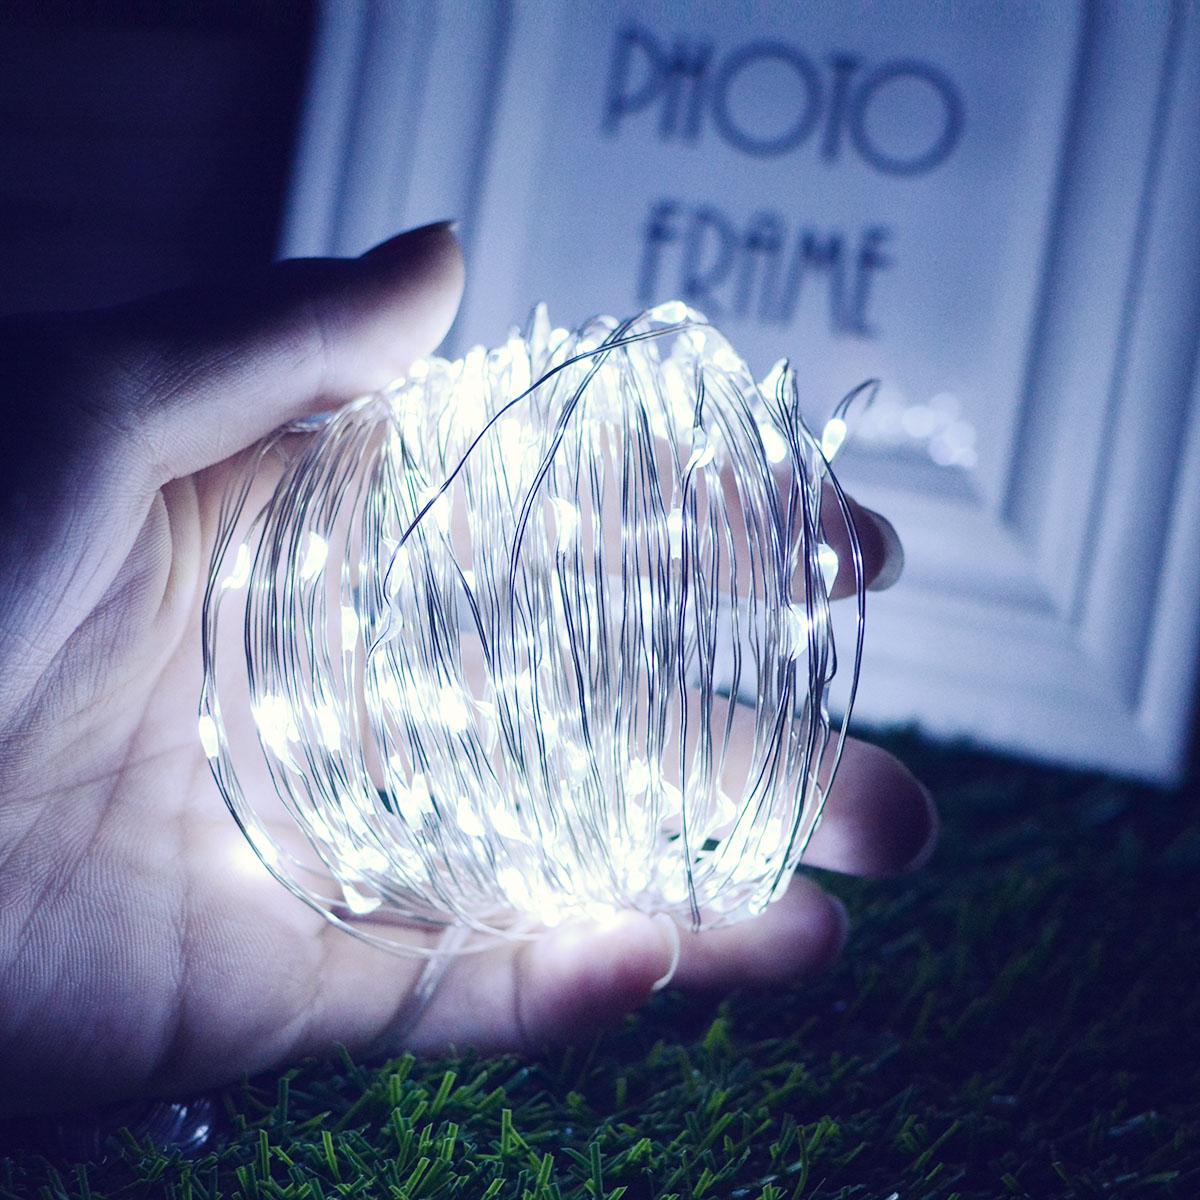 10M/20M 100LEDs/200LEDs Romanstic Solar Powered Copper Wire String Light White light_20 meters 200 LED_(ME0004101)